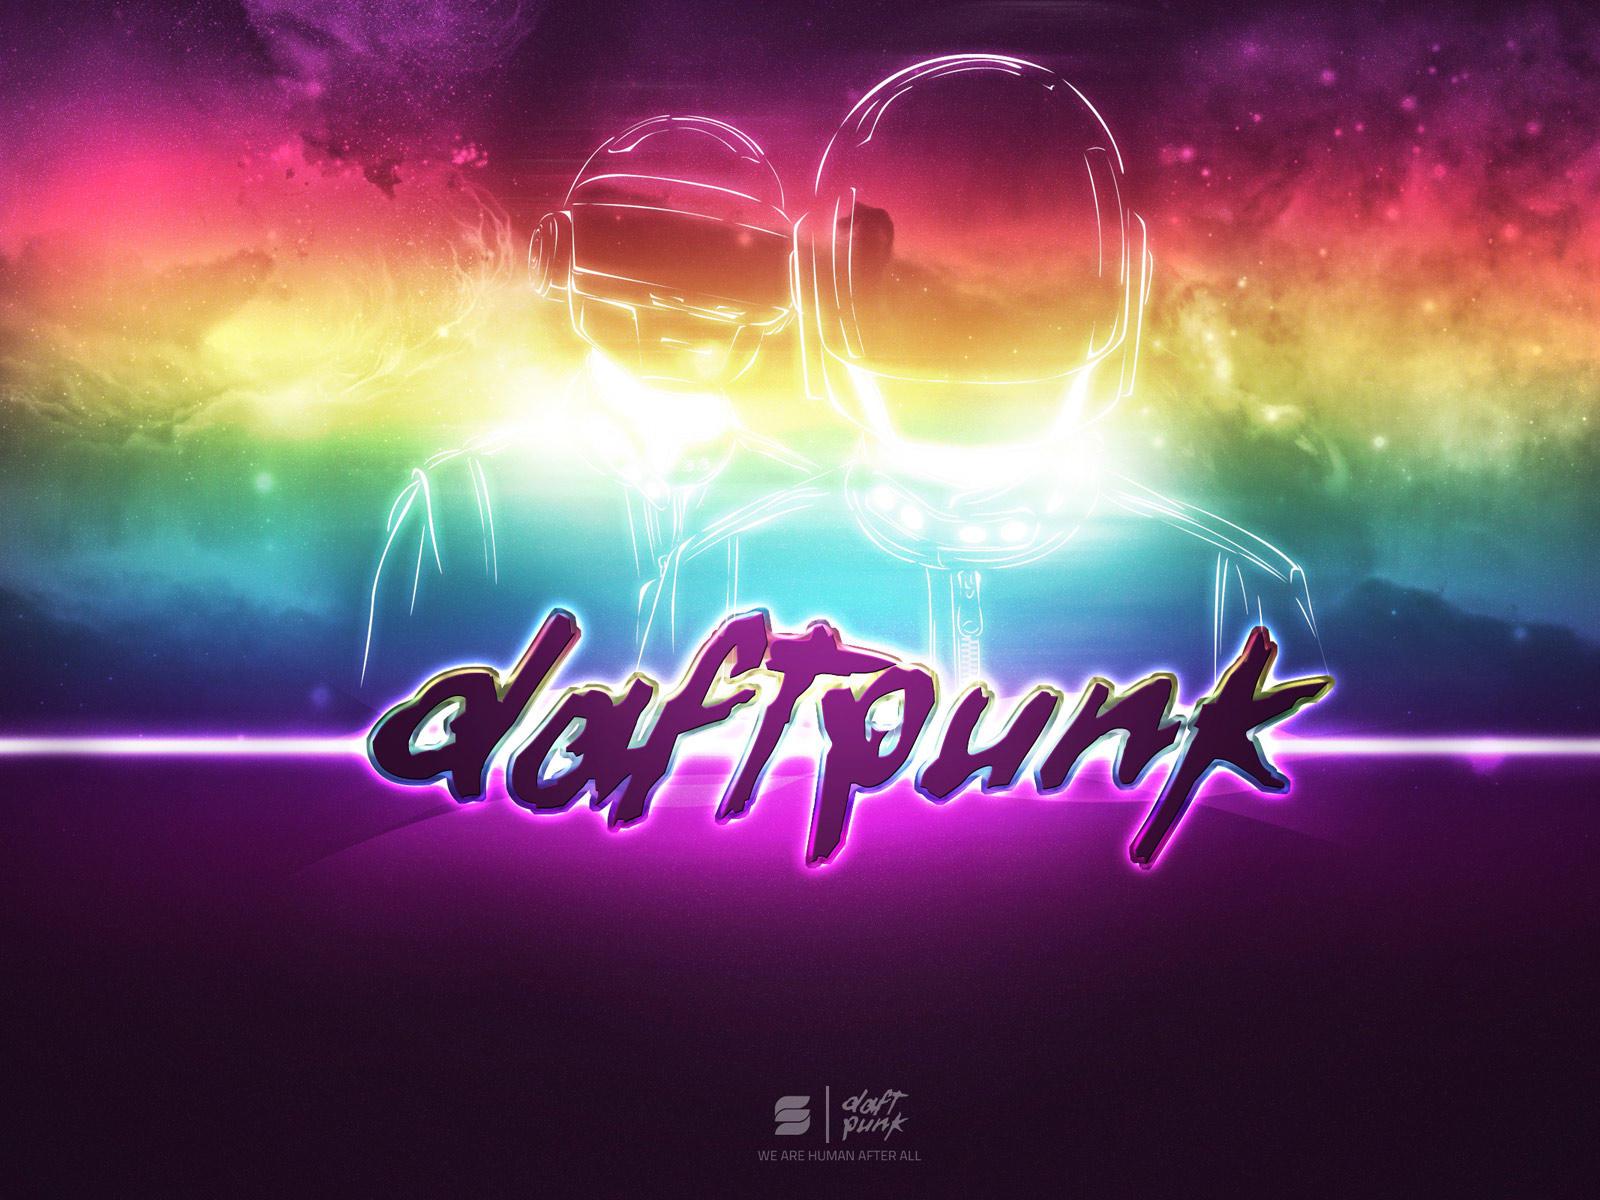 Daft Punk Google Chrome Theme1 by HeroMAU5